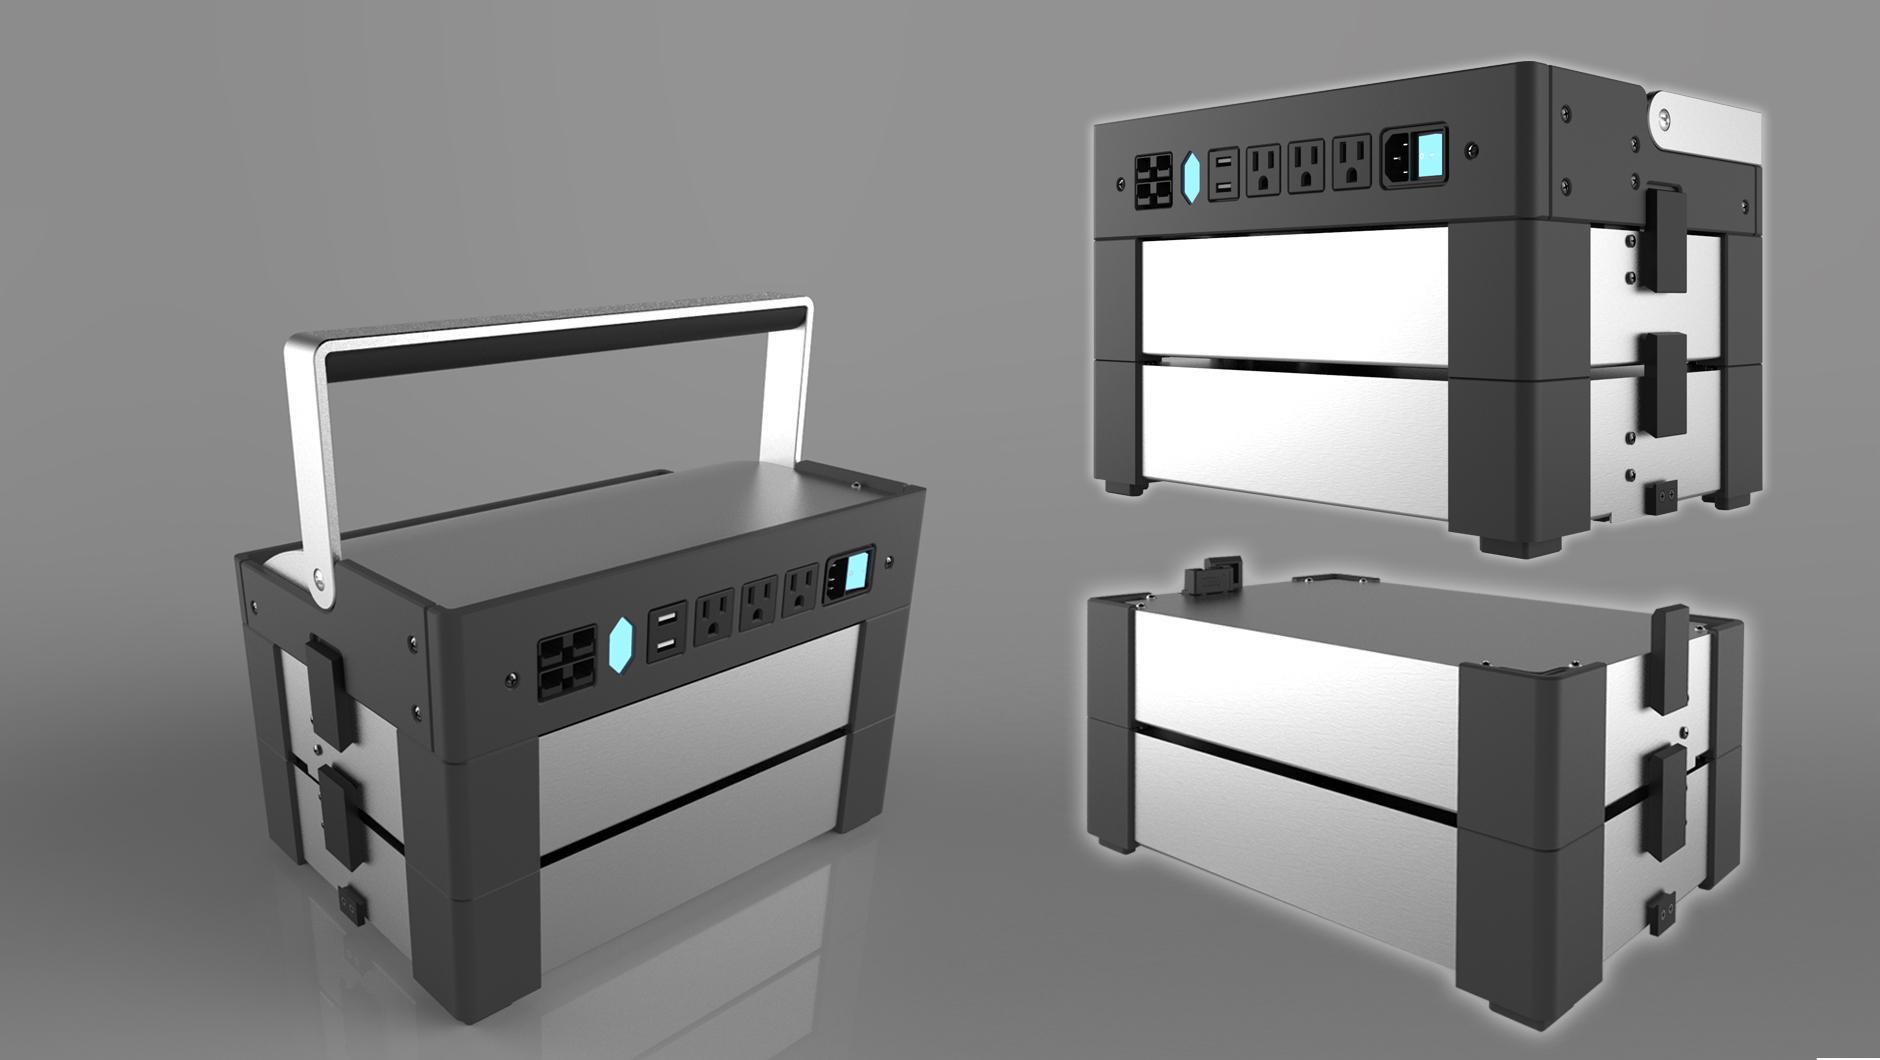 joule case prototyping cad rendering